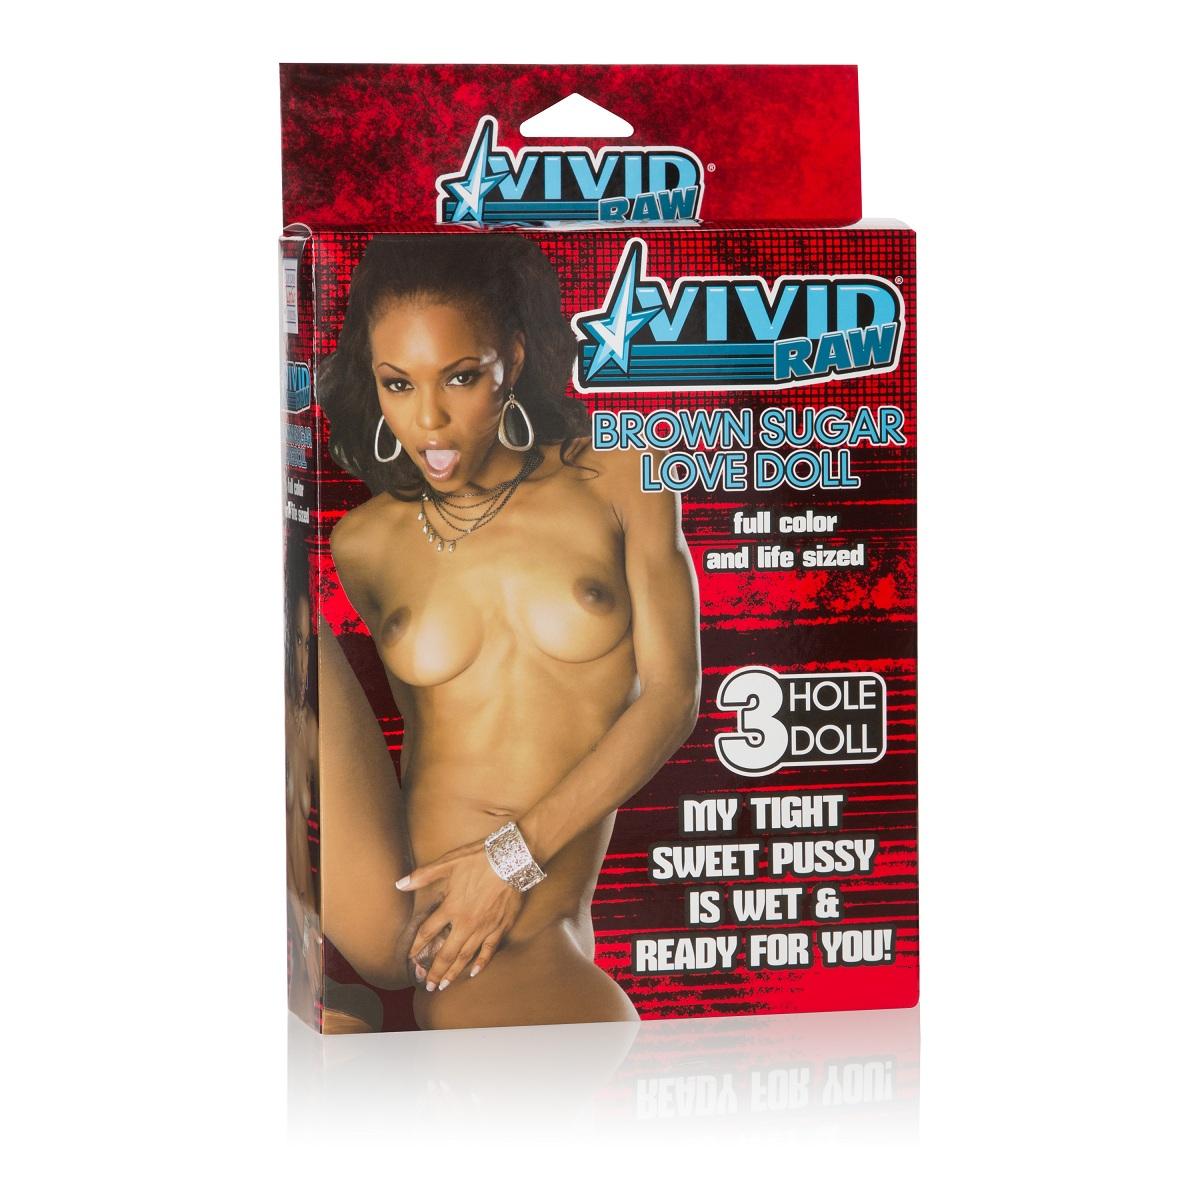 Надувная секс-кукла Vivid Raw Brown Sugar Love Doll  - фото 135485